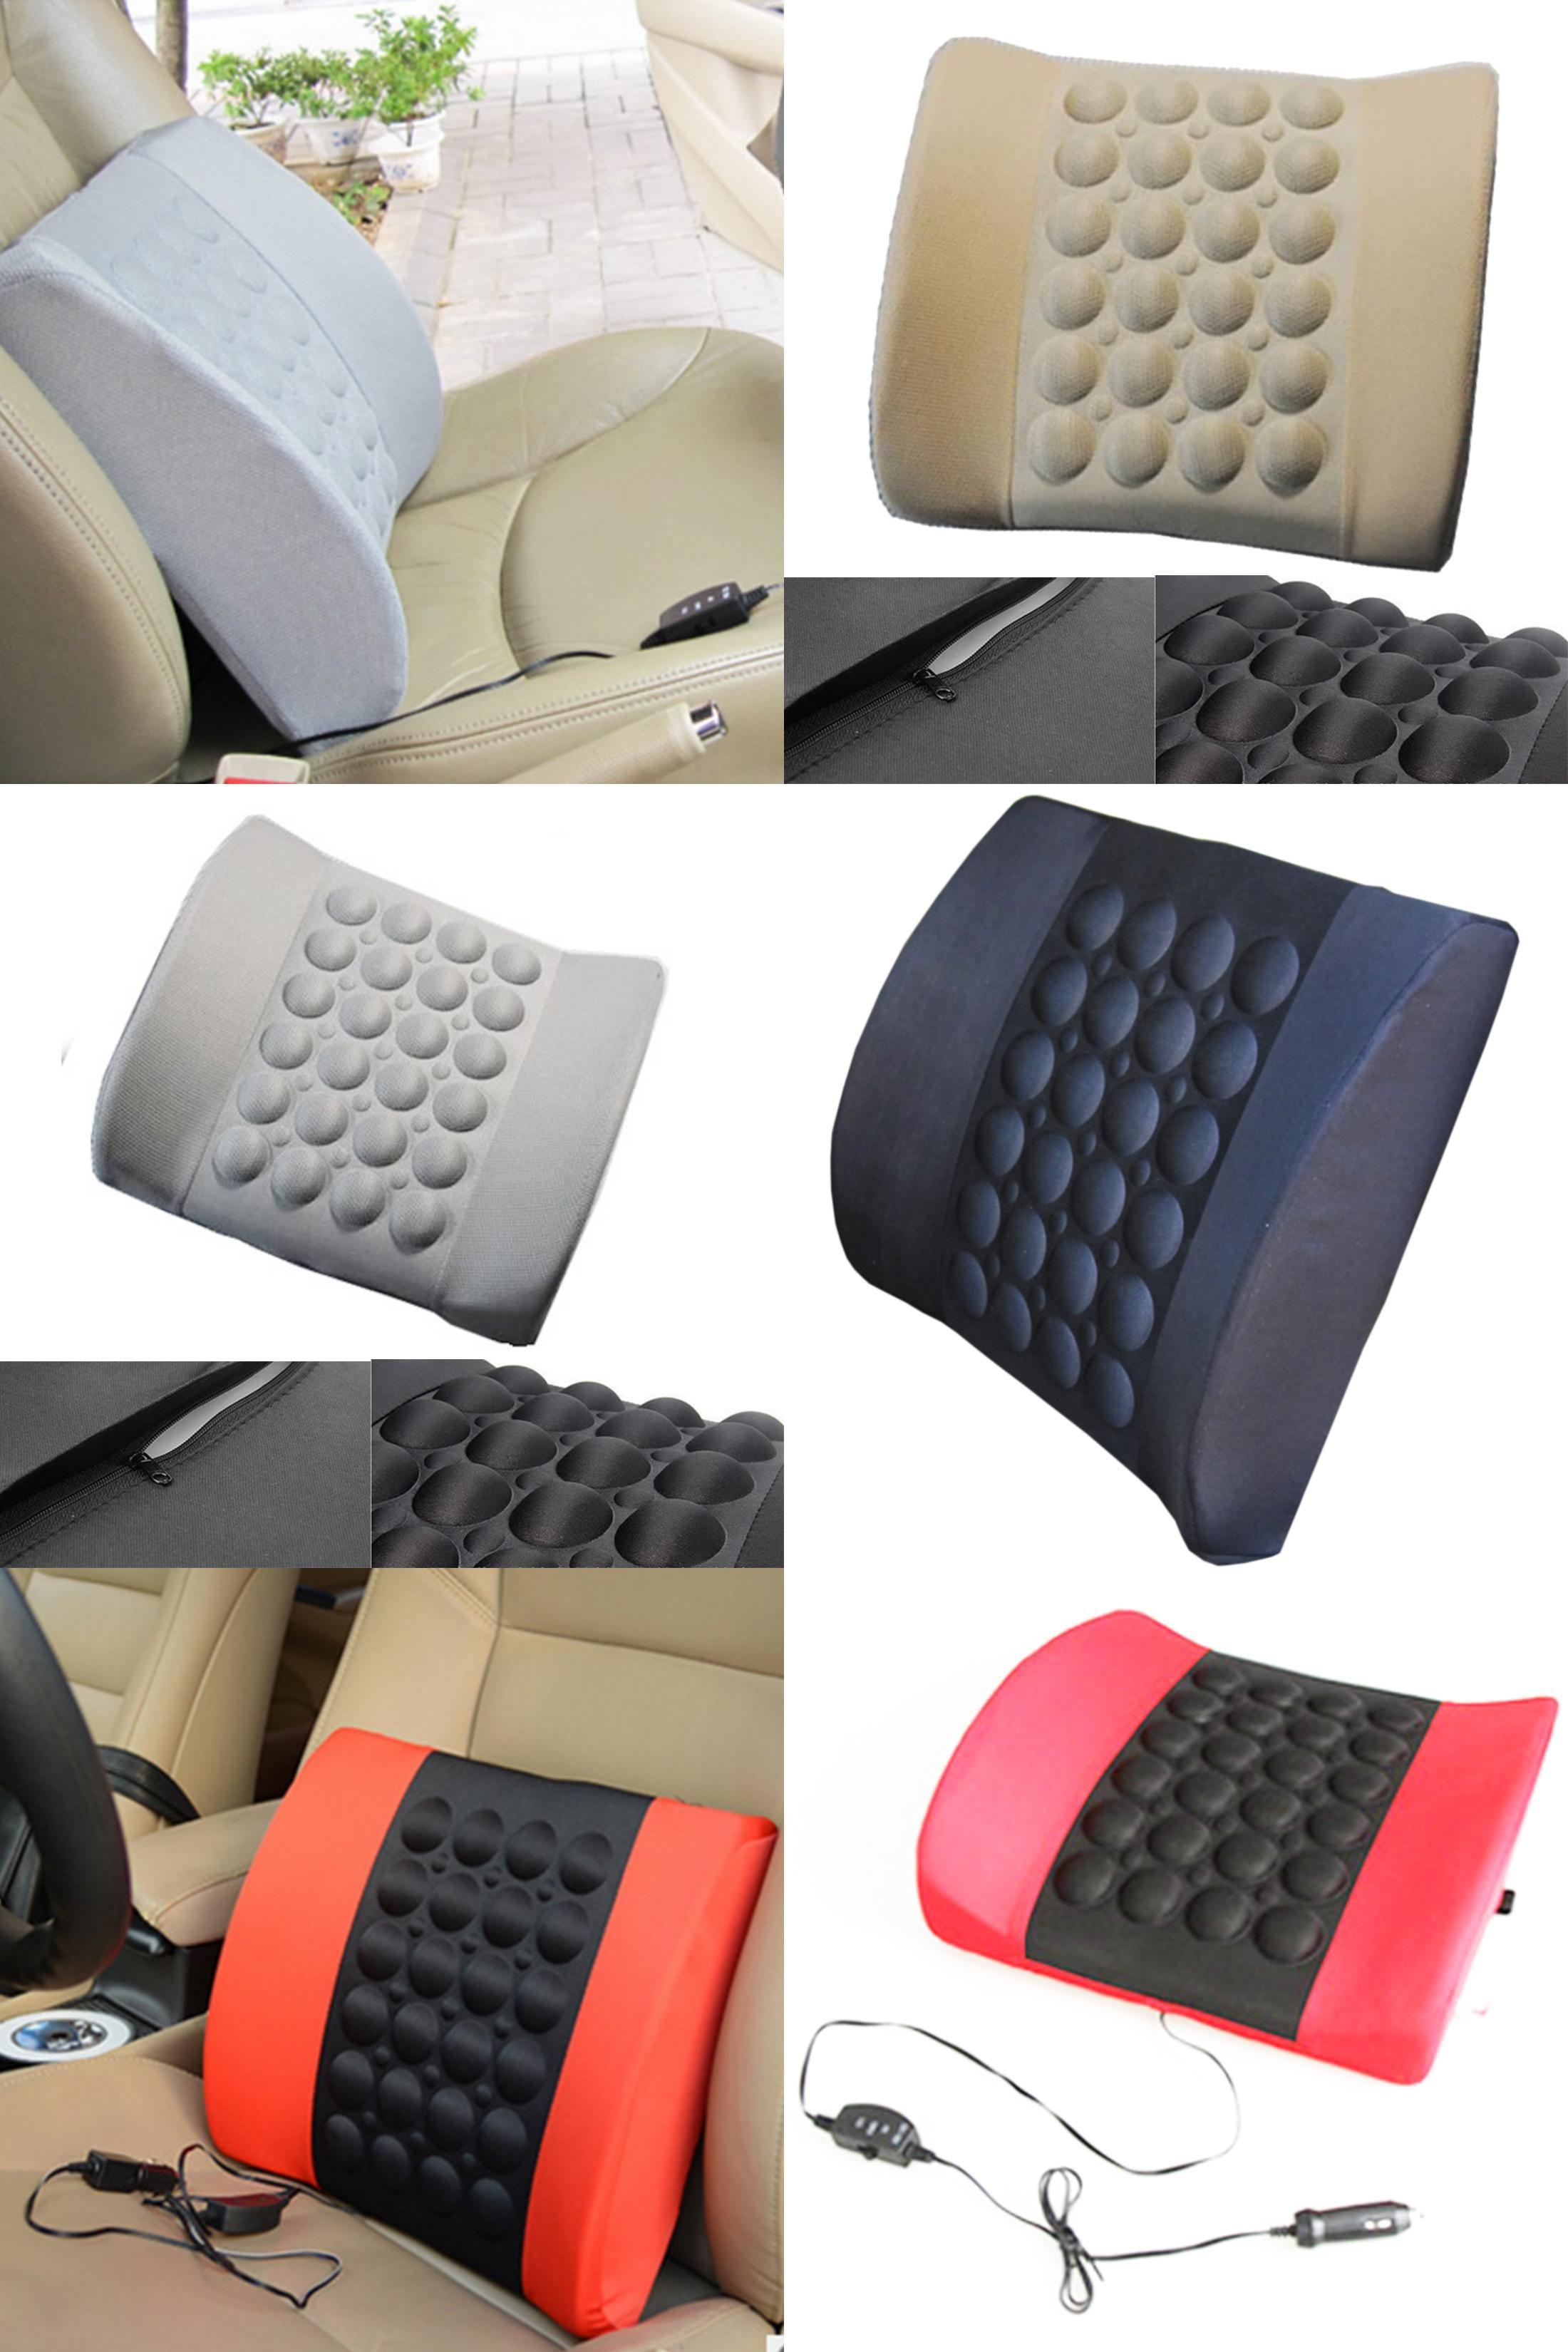 Visit to buy multifunctional electrical car massage lumbar support